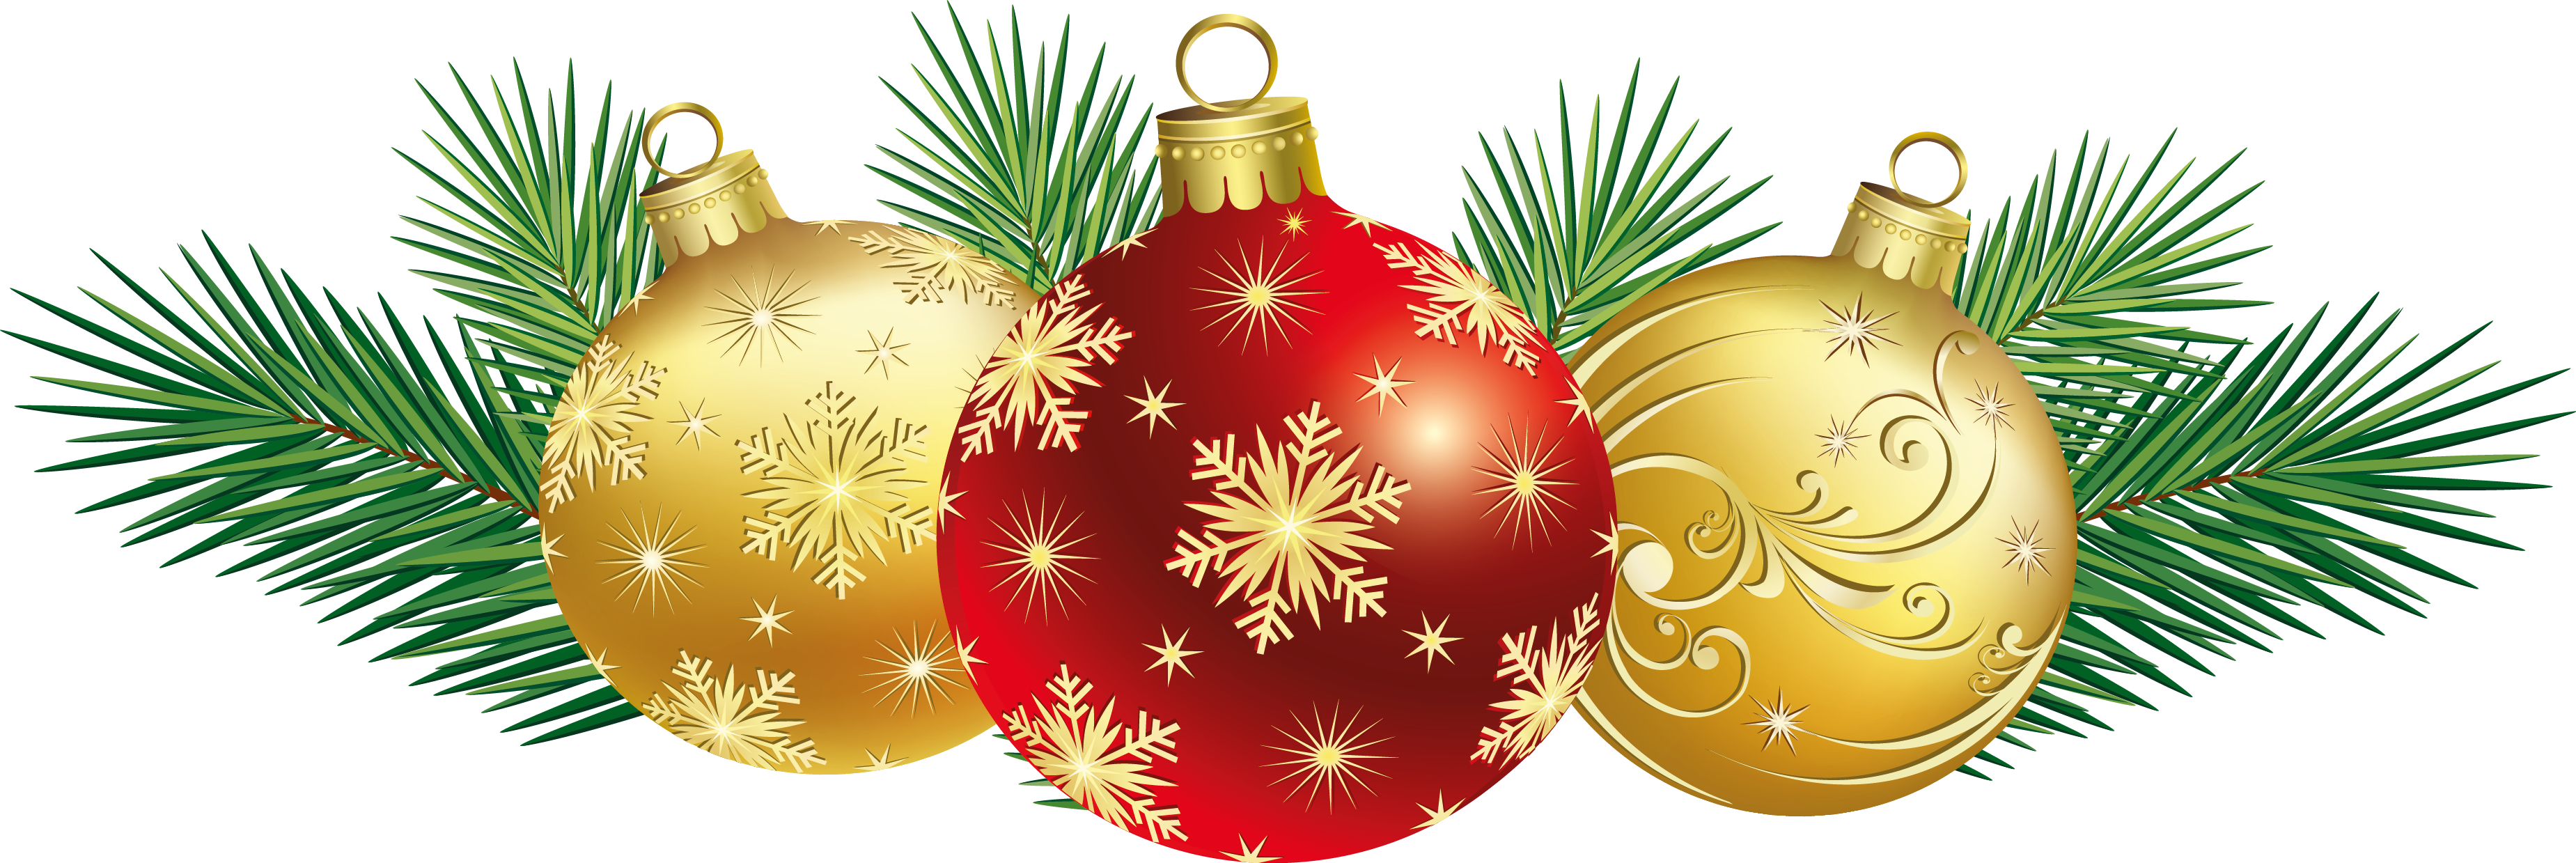 35 Christmas Decorations Clip Art Clipartlook